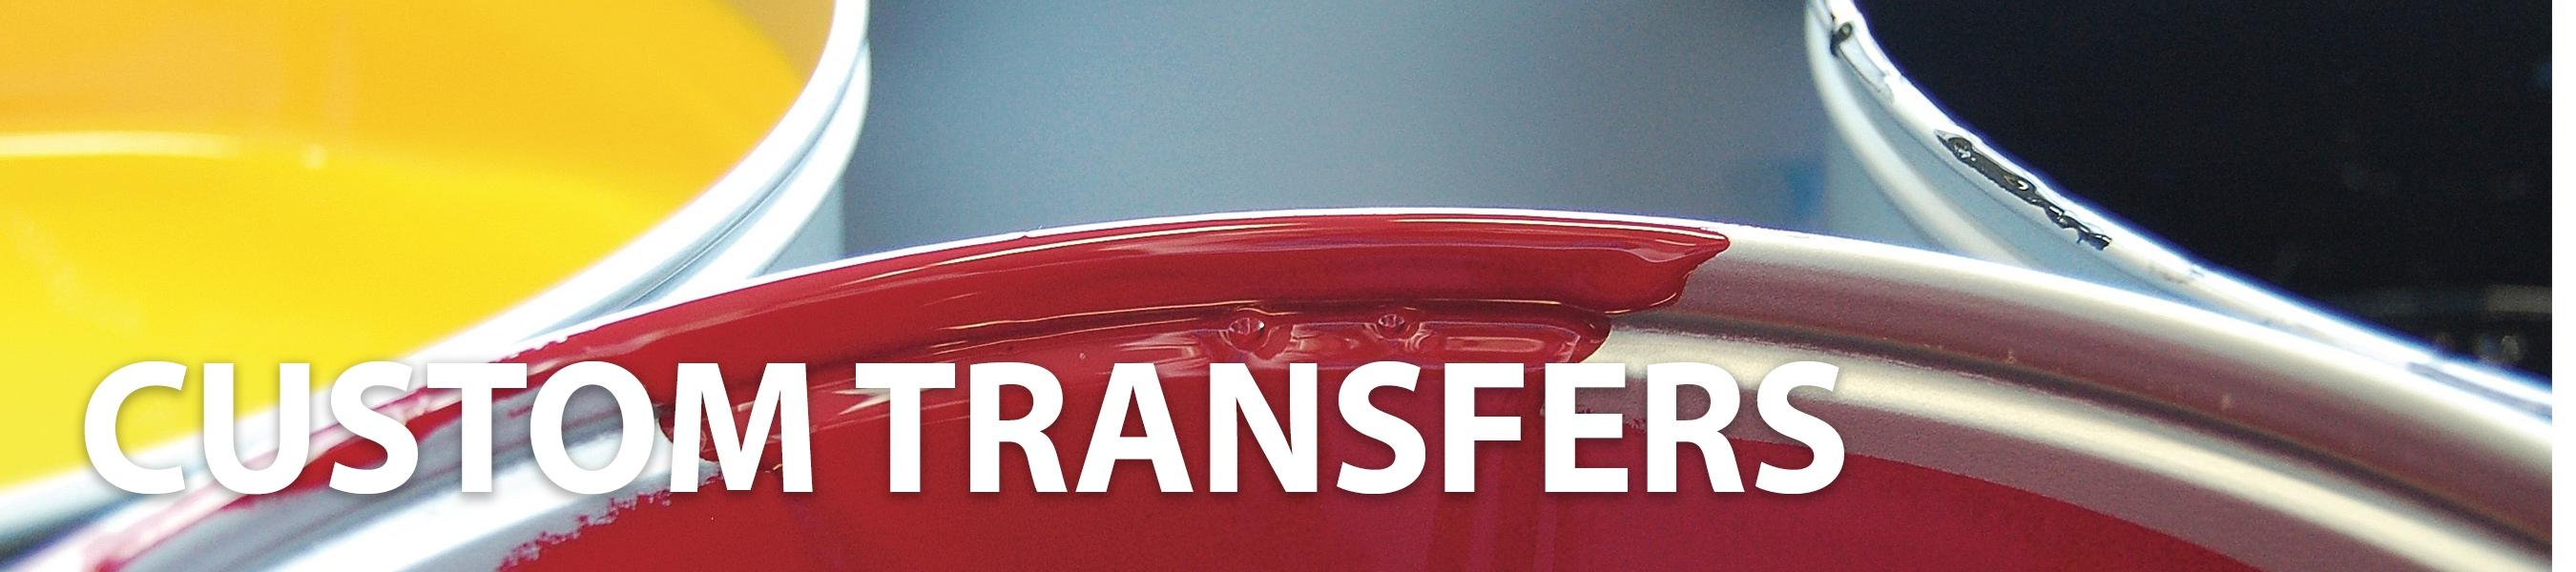 Custom Transfers